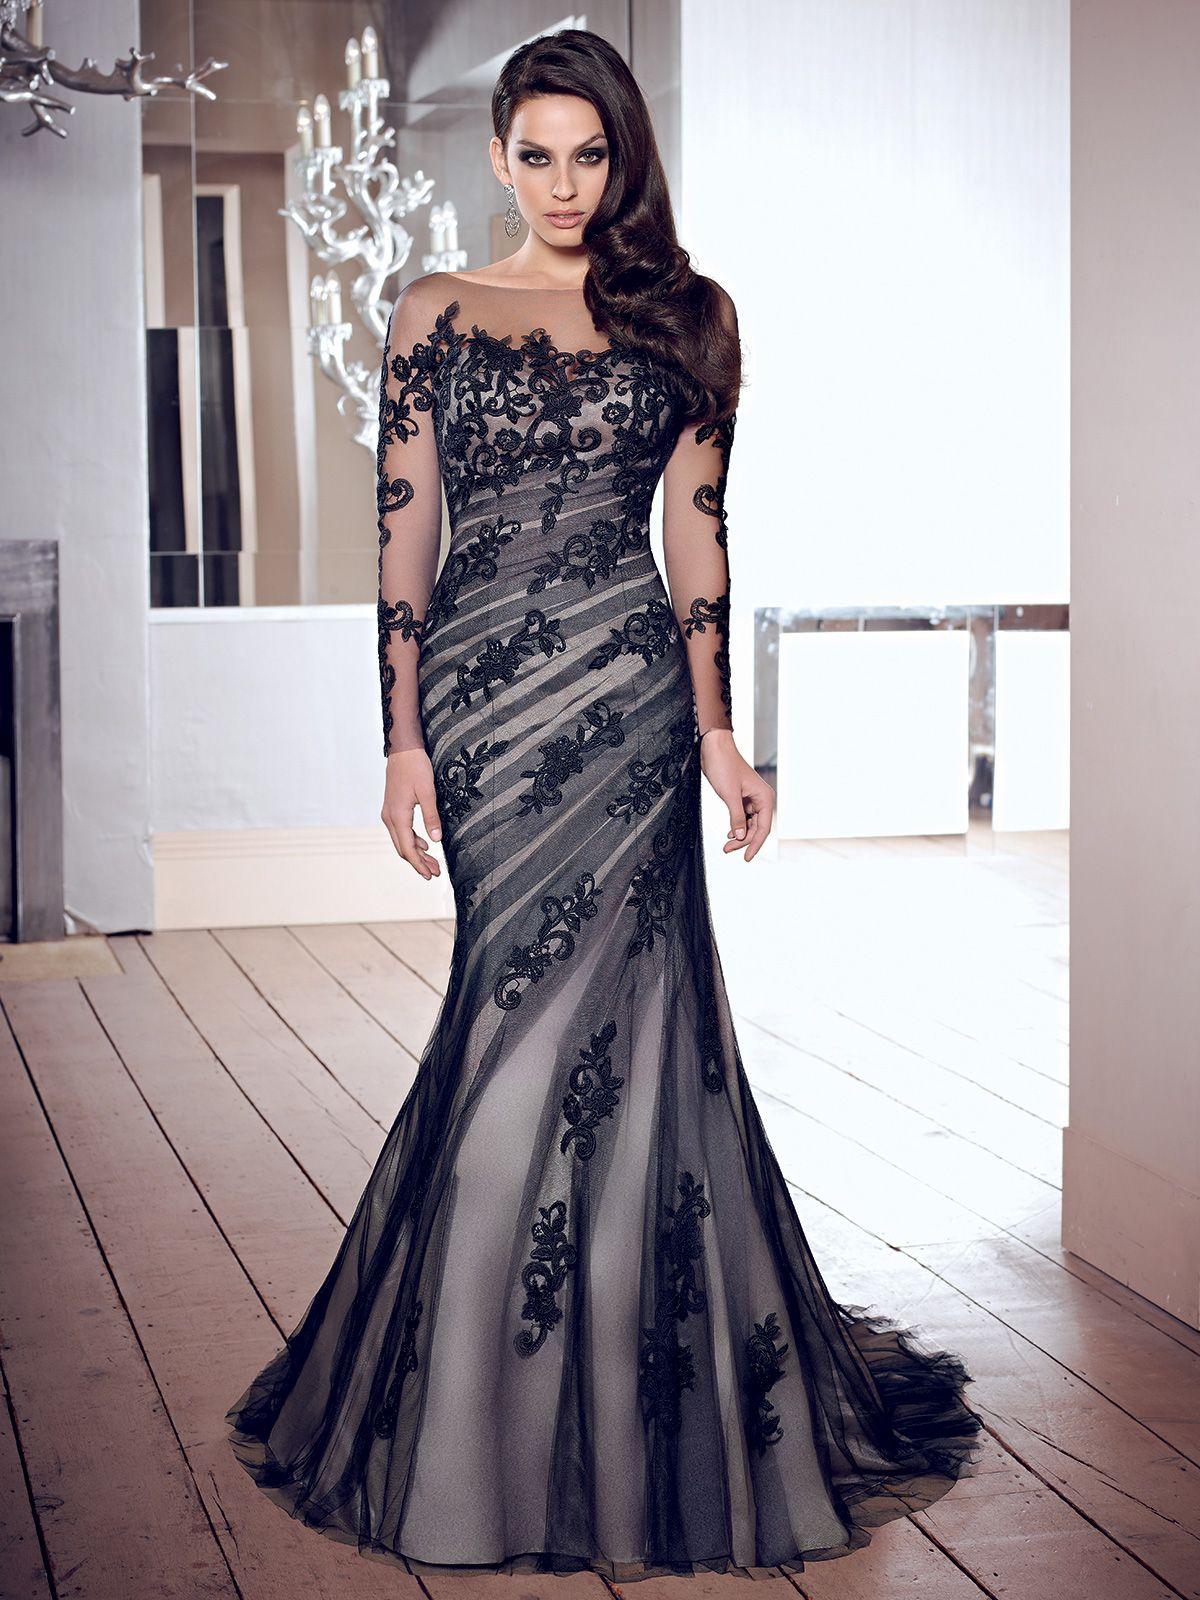 25 Beautiful Mother Of The Bride Dresses | Abschlussball kleider ...